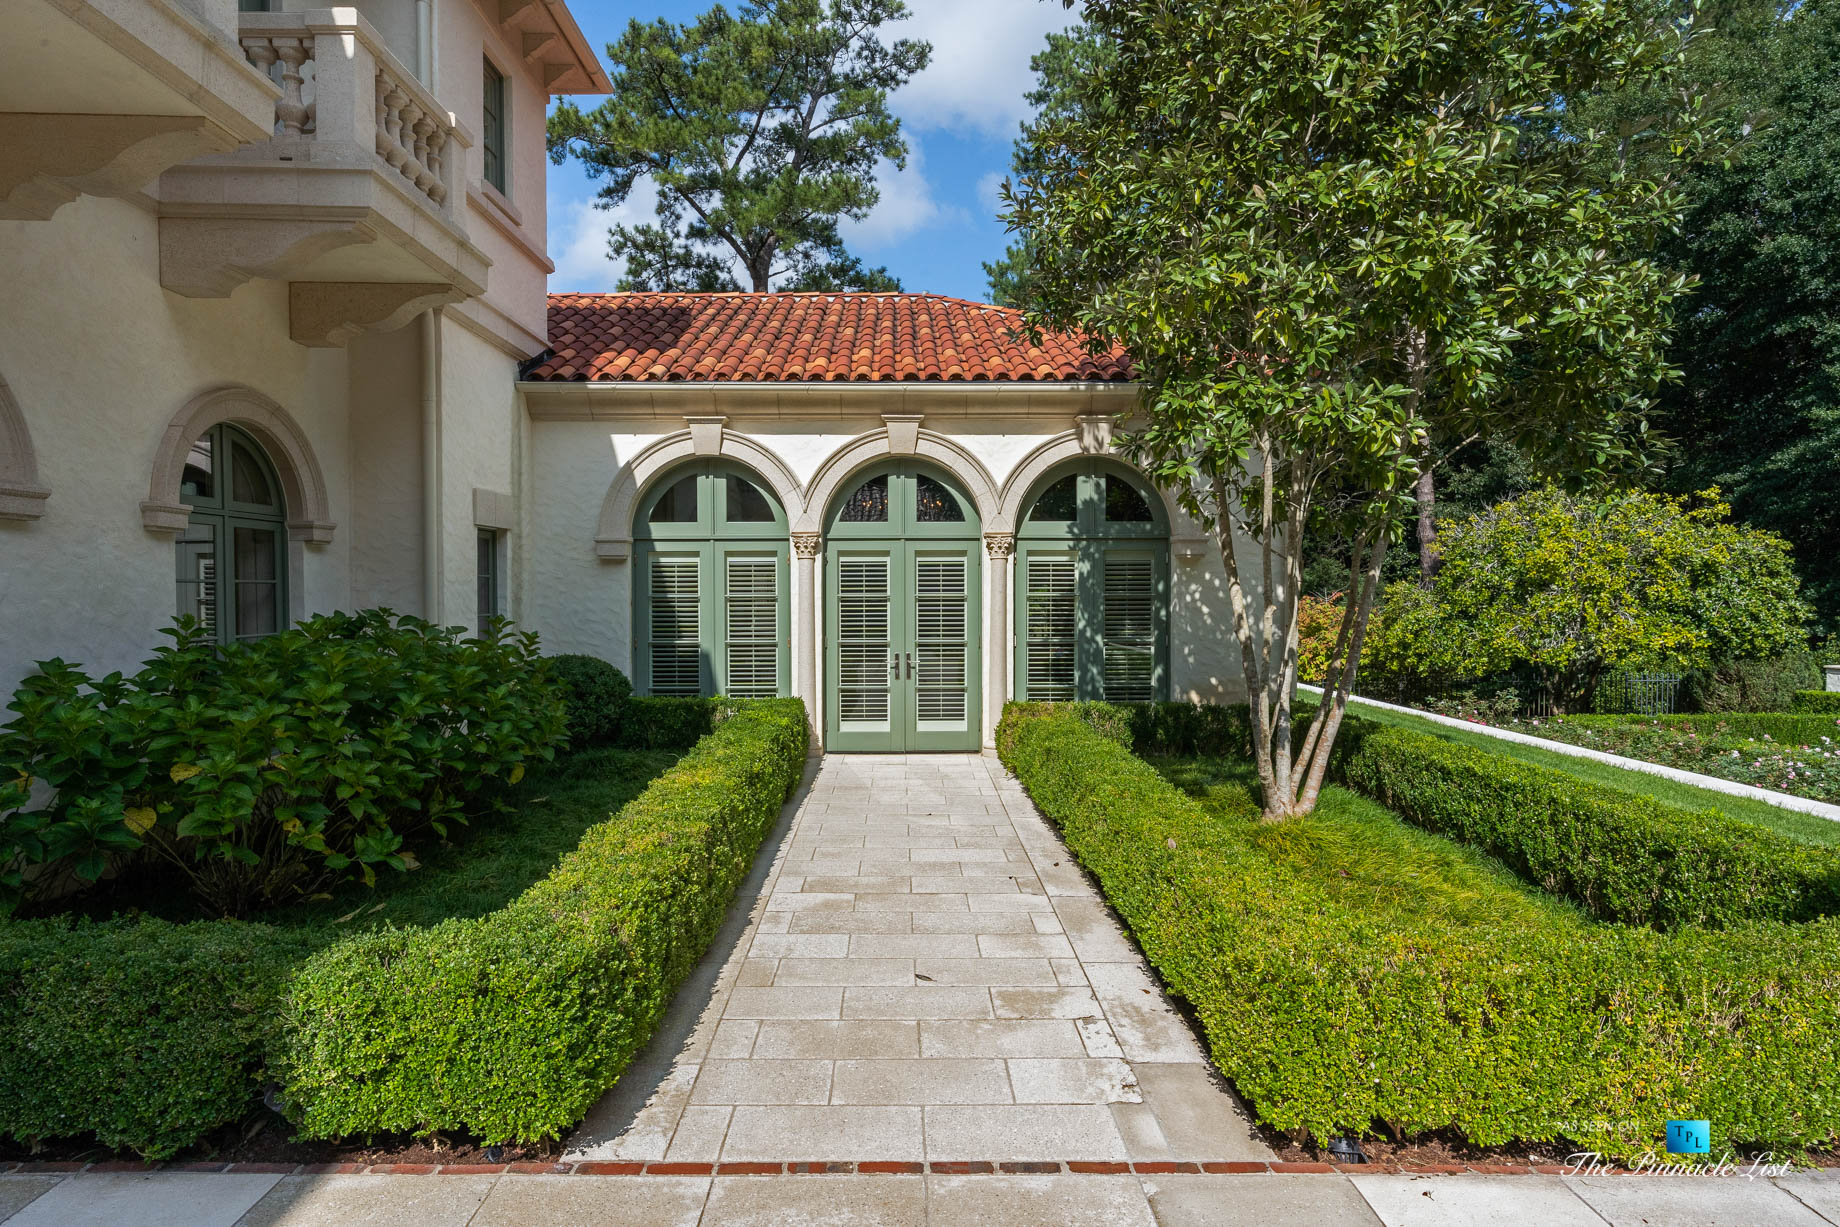 439 Blackland Rd NW, Atlanta, GA, USA – Property Landscaping Detail – Luxury Real Estate – Tuxedo Park Mediterranean Mansion Home